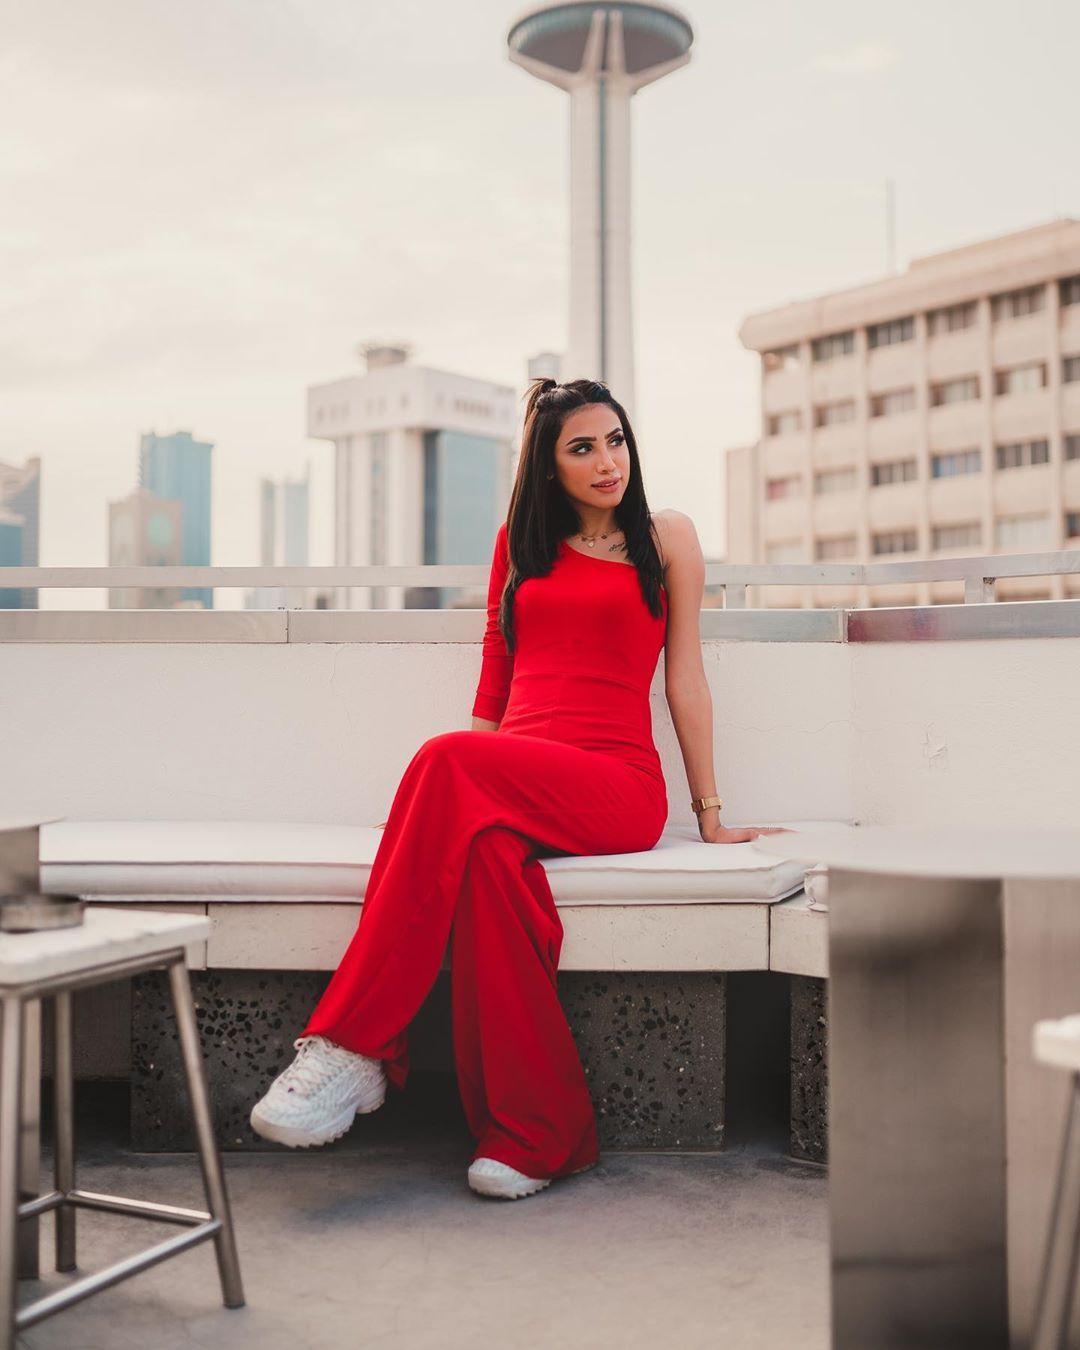 Red One Shoulder Long Sleeve Jumpsuit Jumpsuit Jumpsuits Jumpsuit With Sleeves Long Sleeve Jumpsuit Fashion